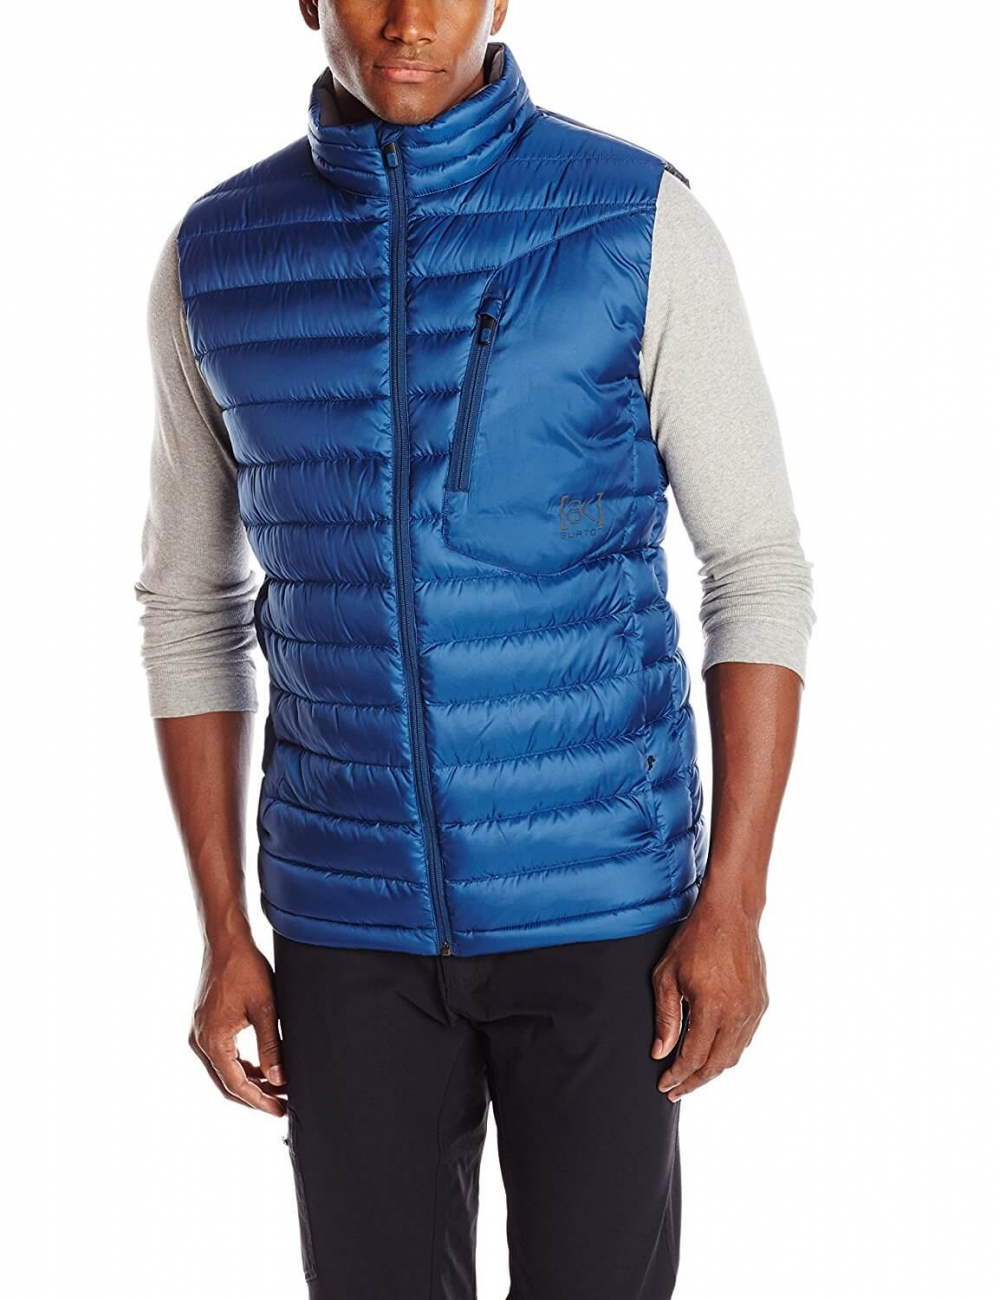 Жилет BURTON ak bk down vest  (размер L) - 3